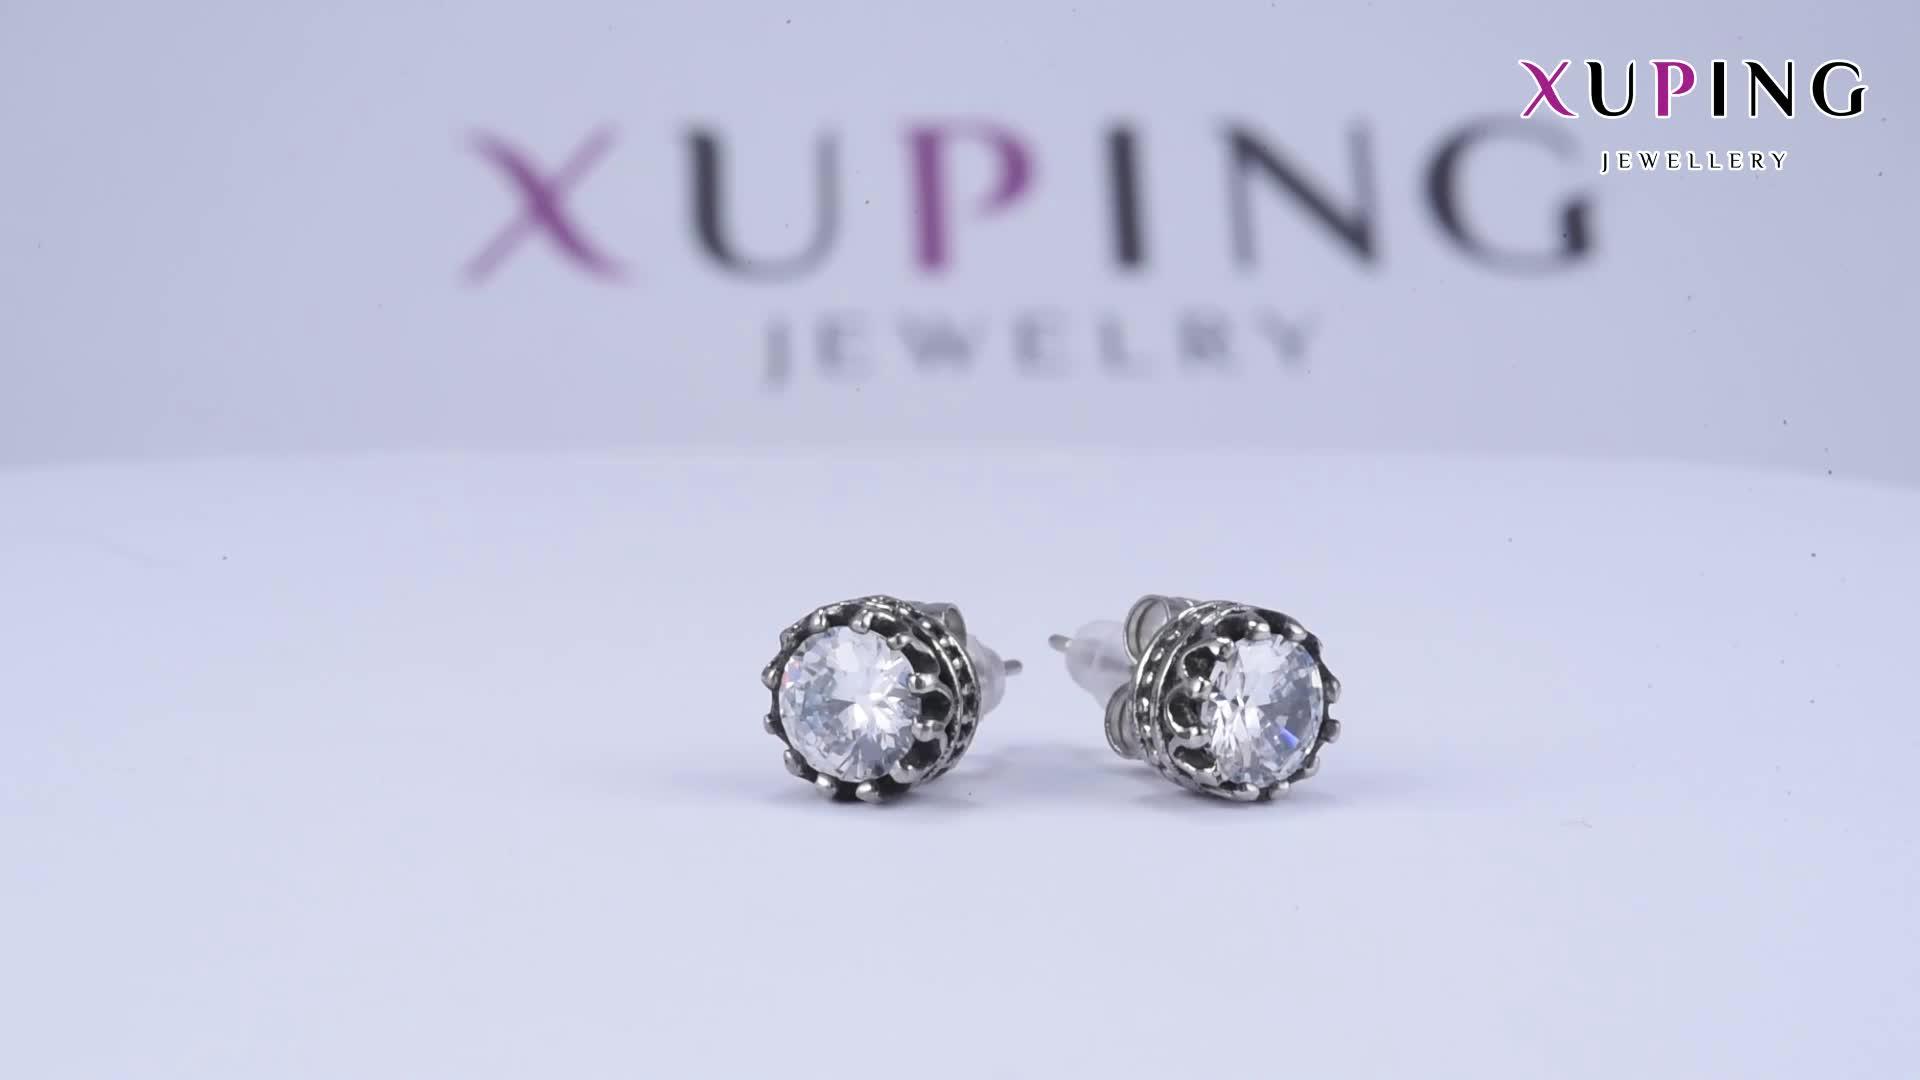 95388 xuping fashion big diamond earring Stainless Steel earring